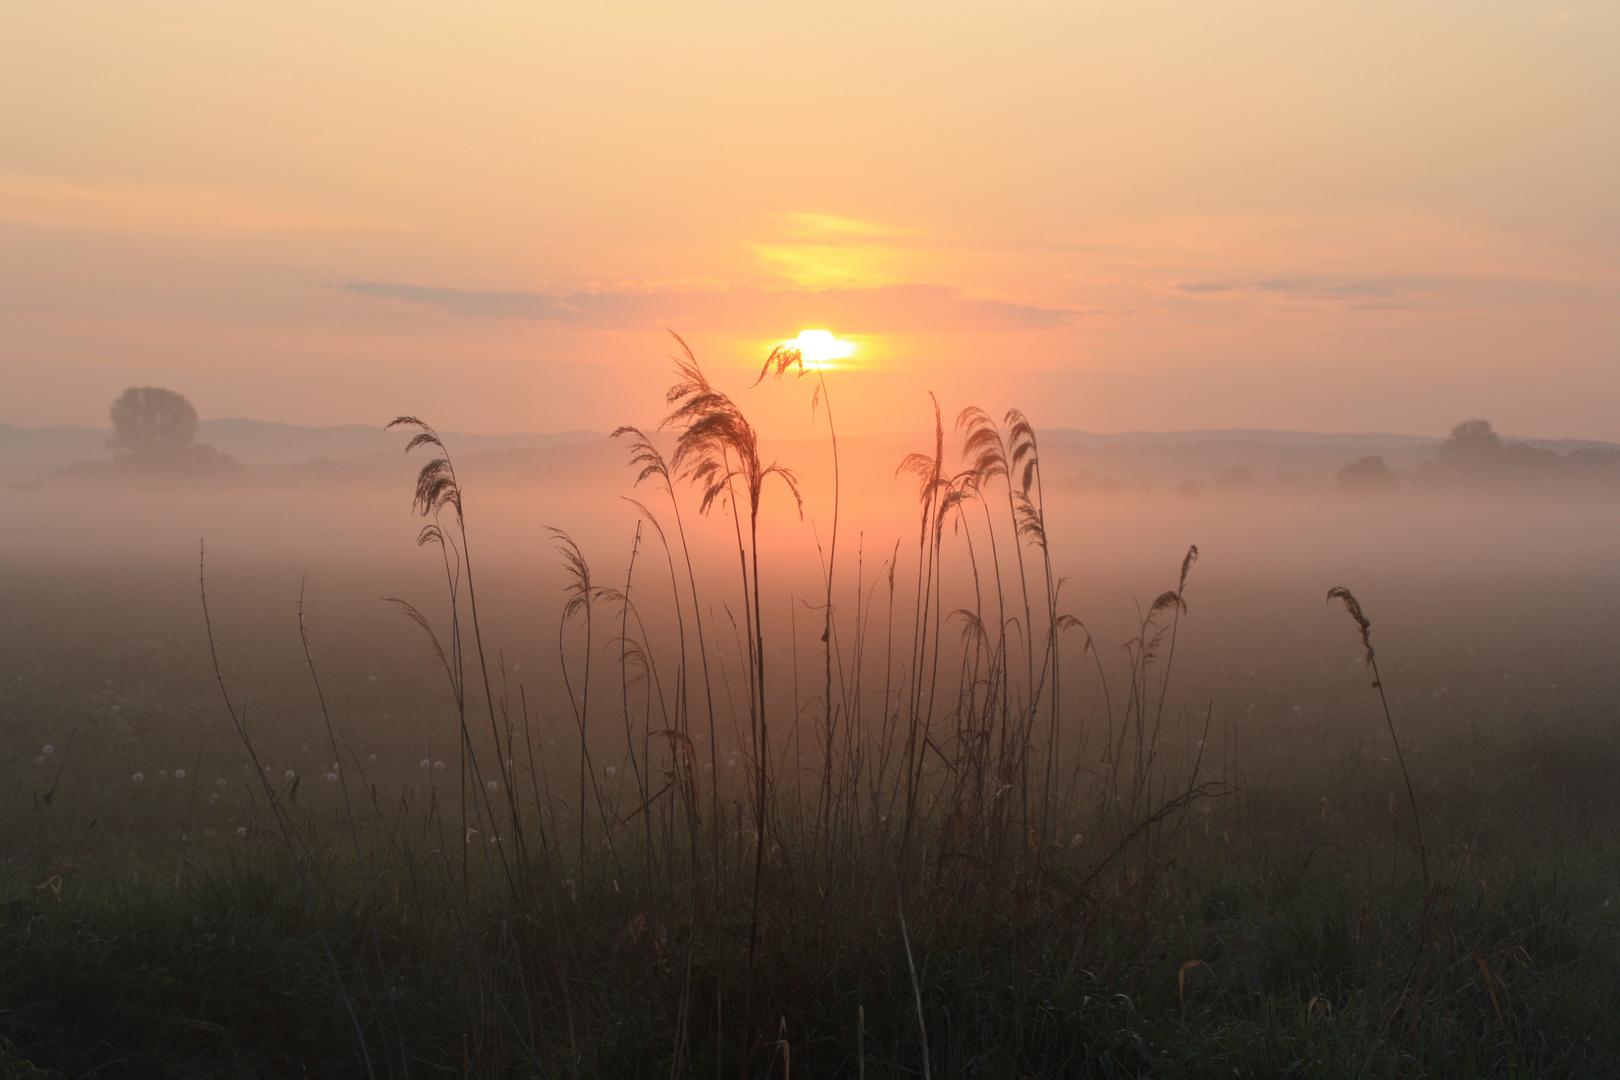 Sonnenaufgang bei Baiersdorf